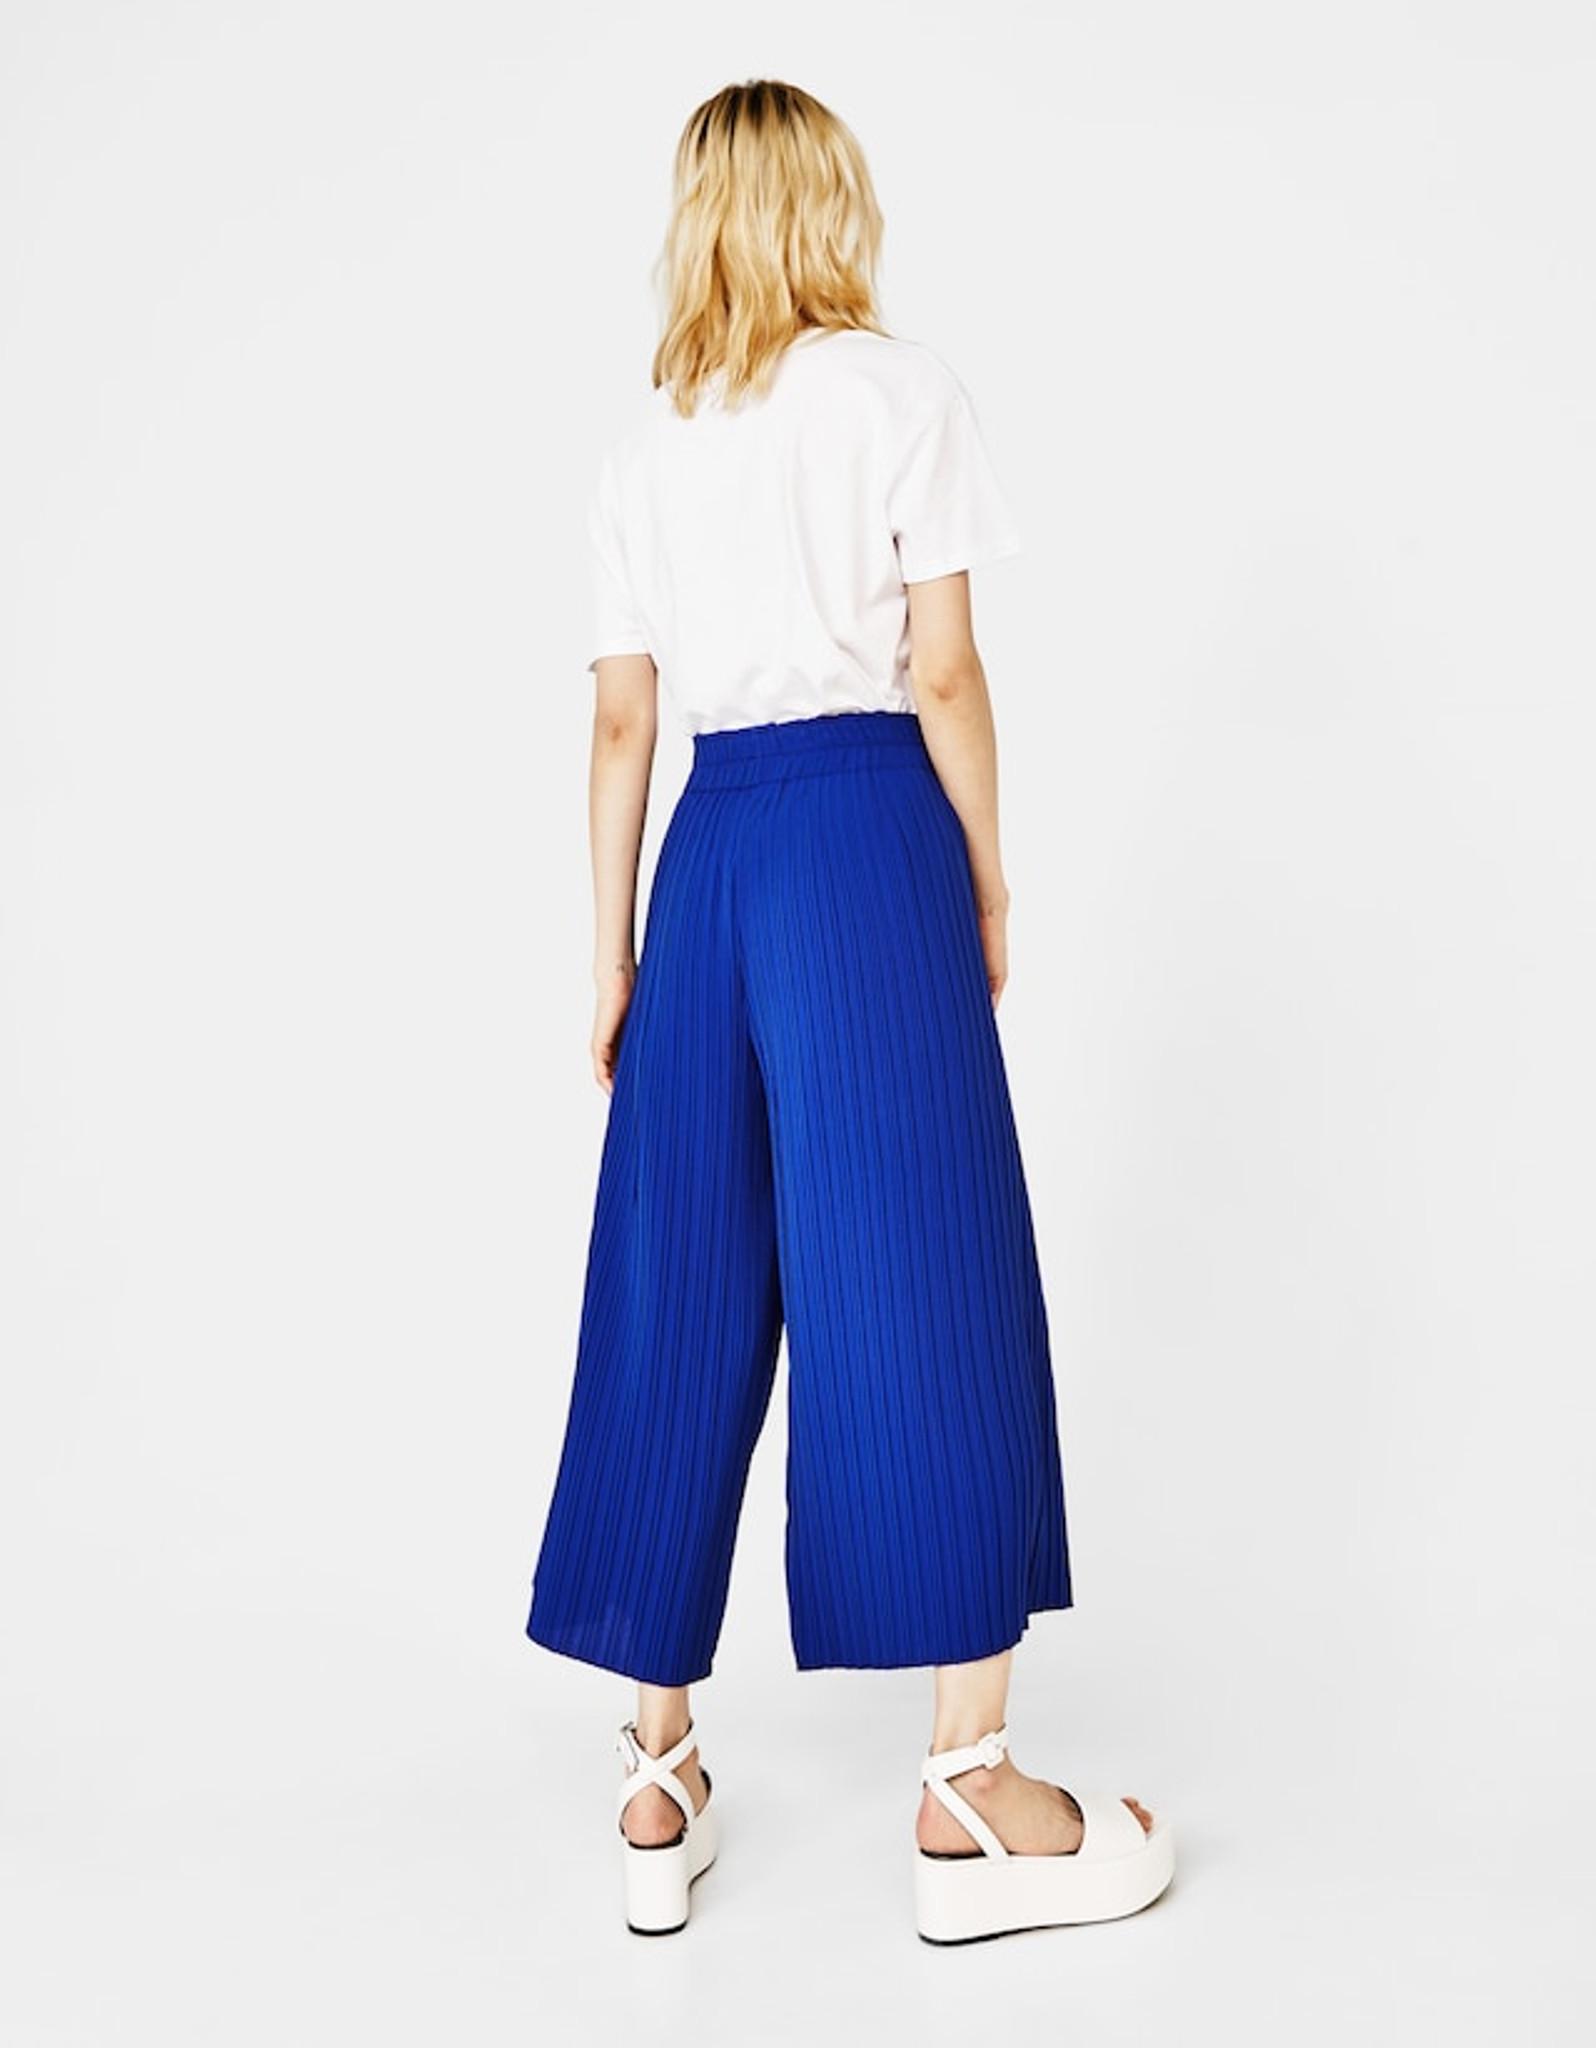 Fifth Avenue Womens Georgette JIMZ Pleated Pants - Royal Blue